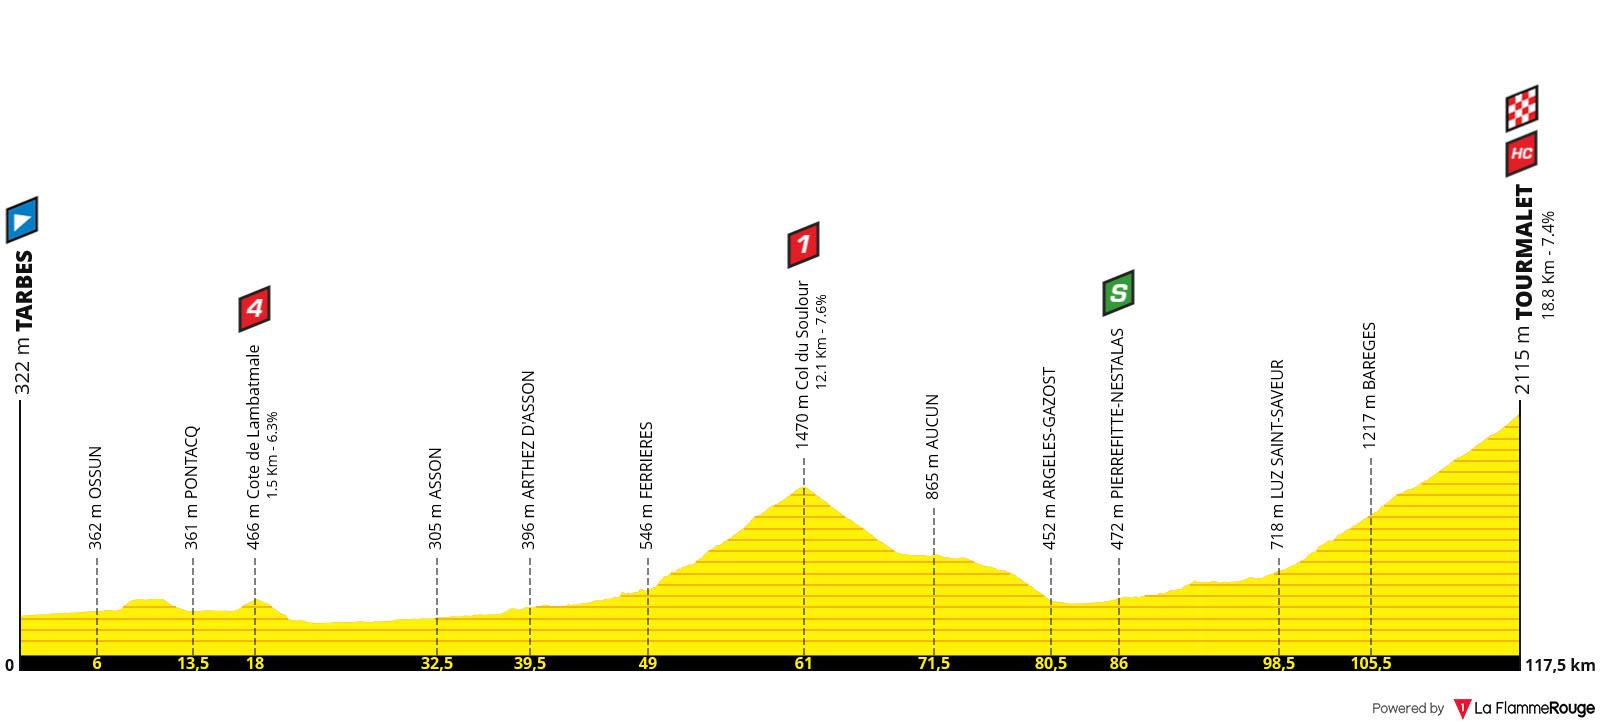 Perfil Etapa 14 - Tour de Francia 2019